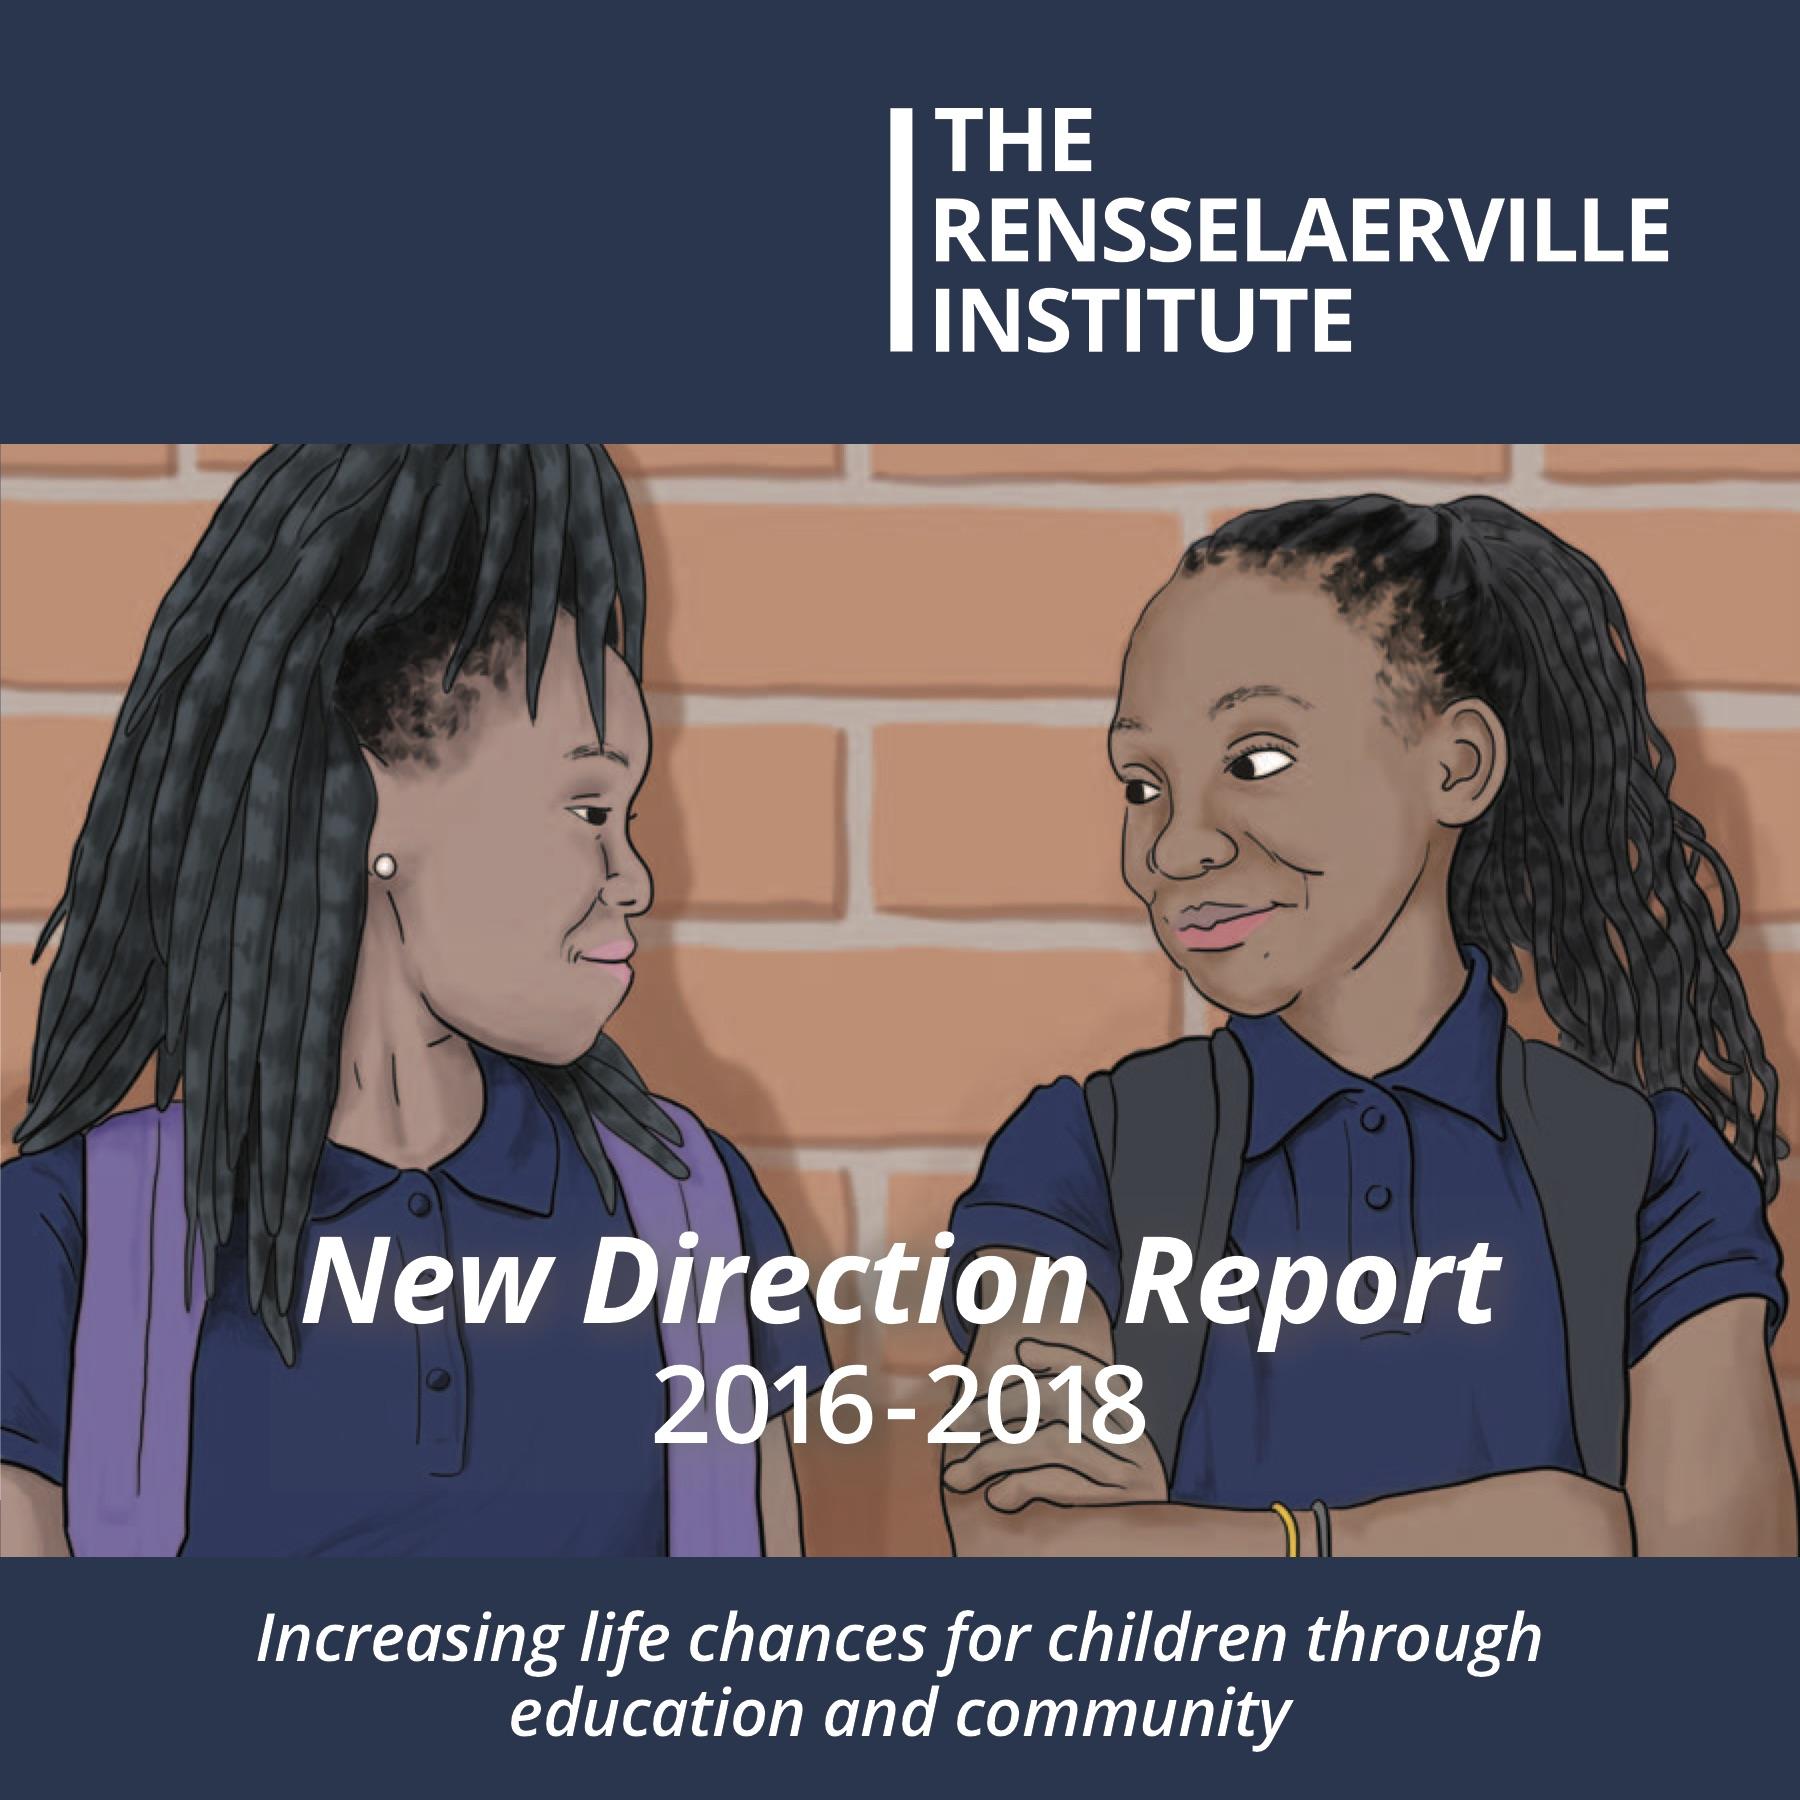 TRI 2016-18 Annual Report Cover.jpg